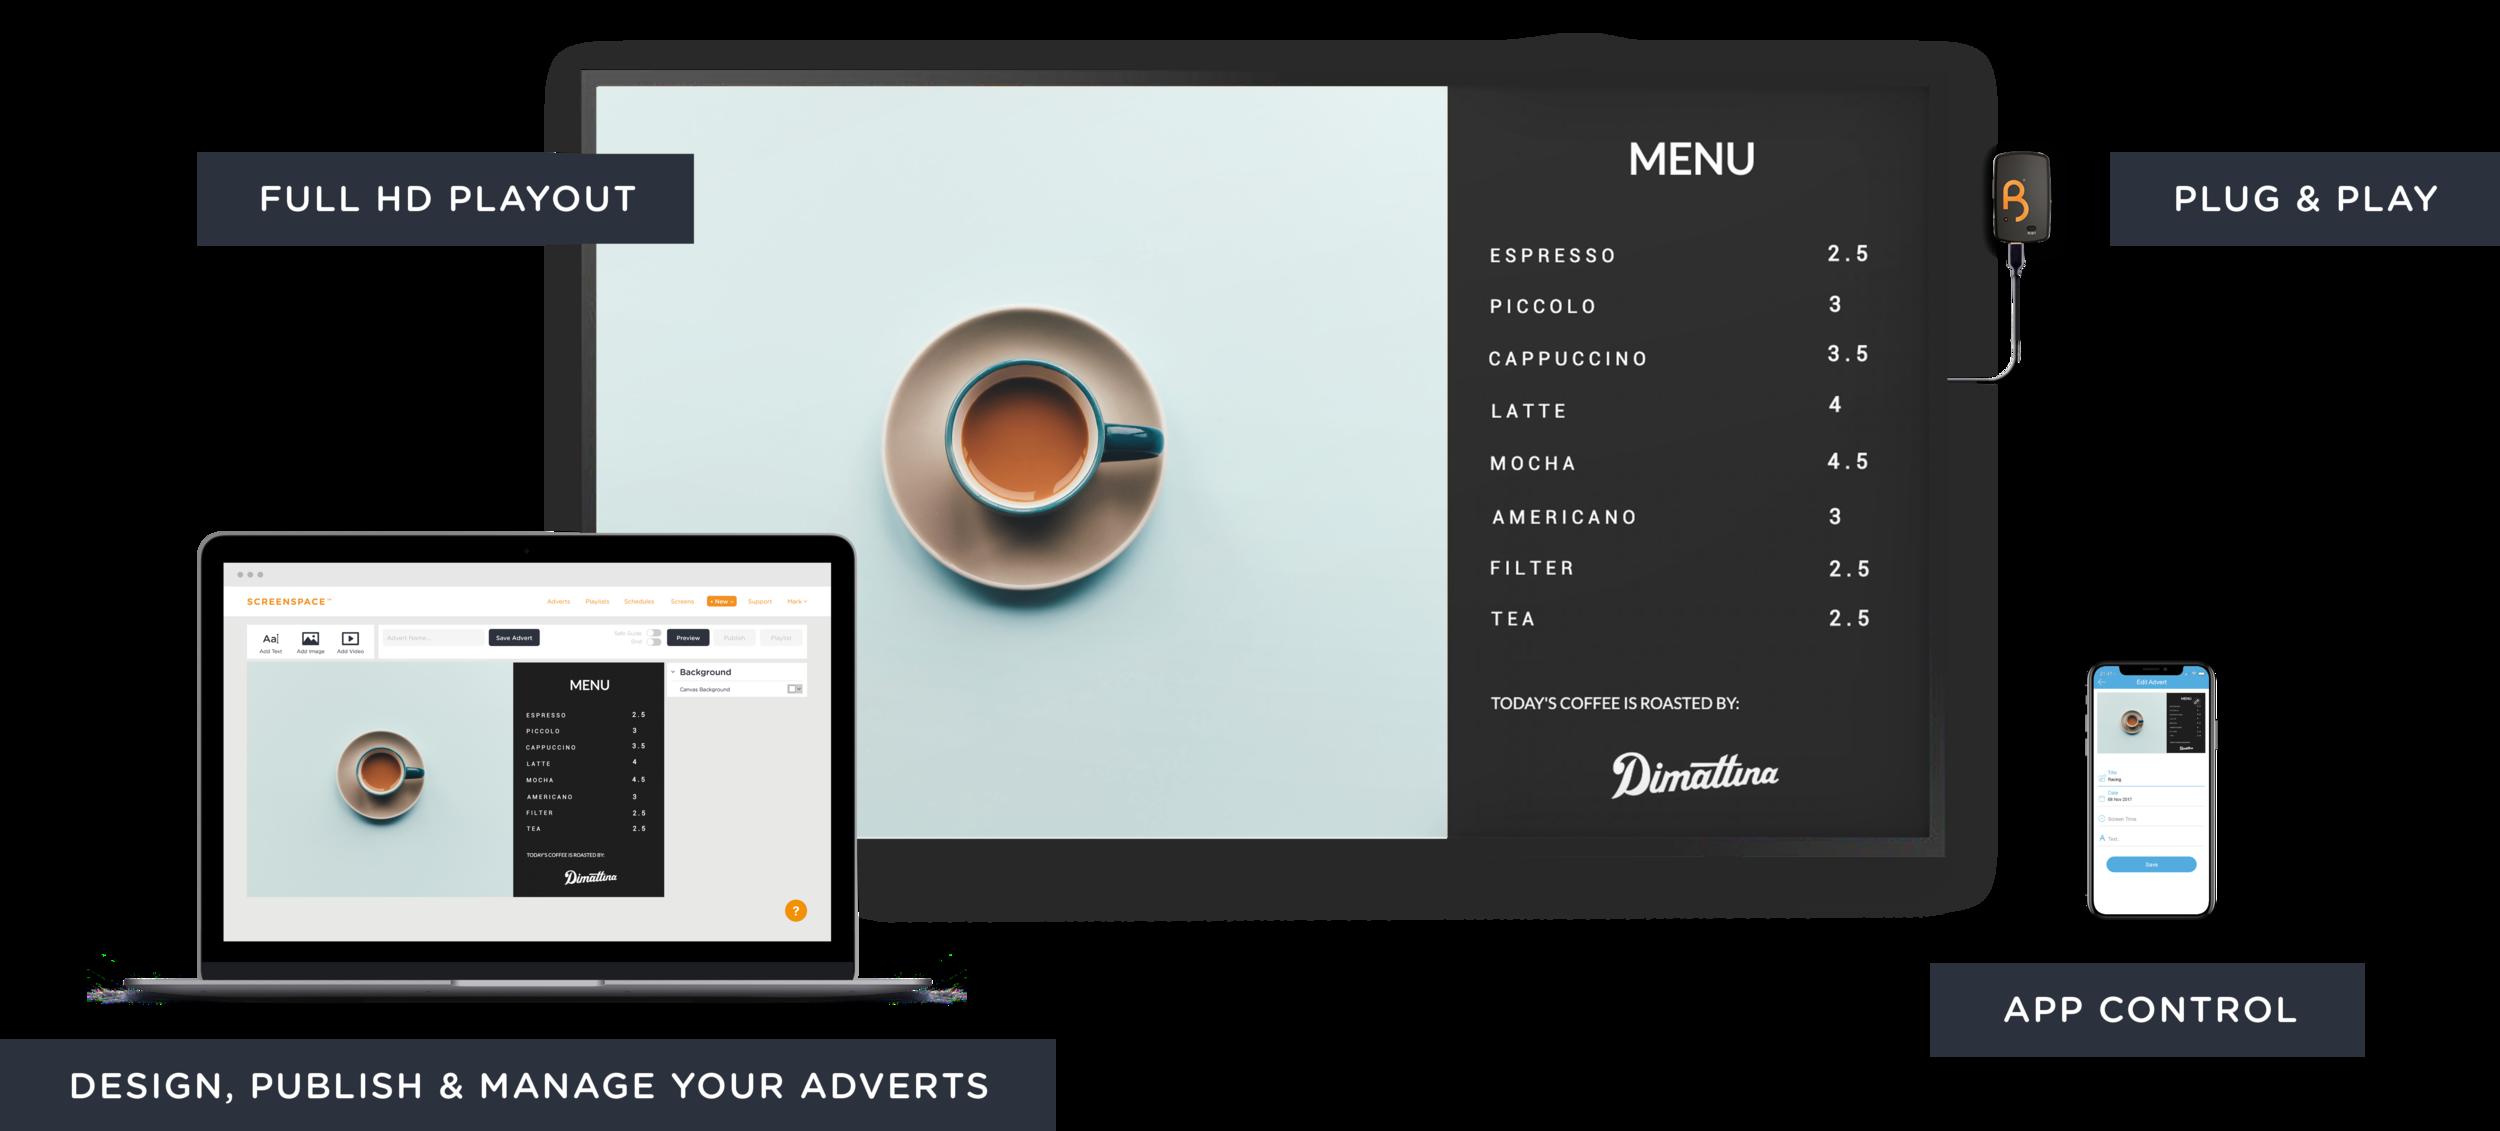 screenspace-mockup_coffee_v2.png